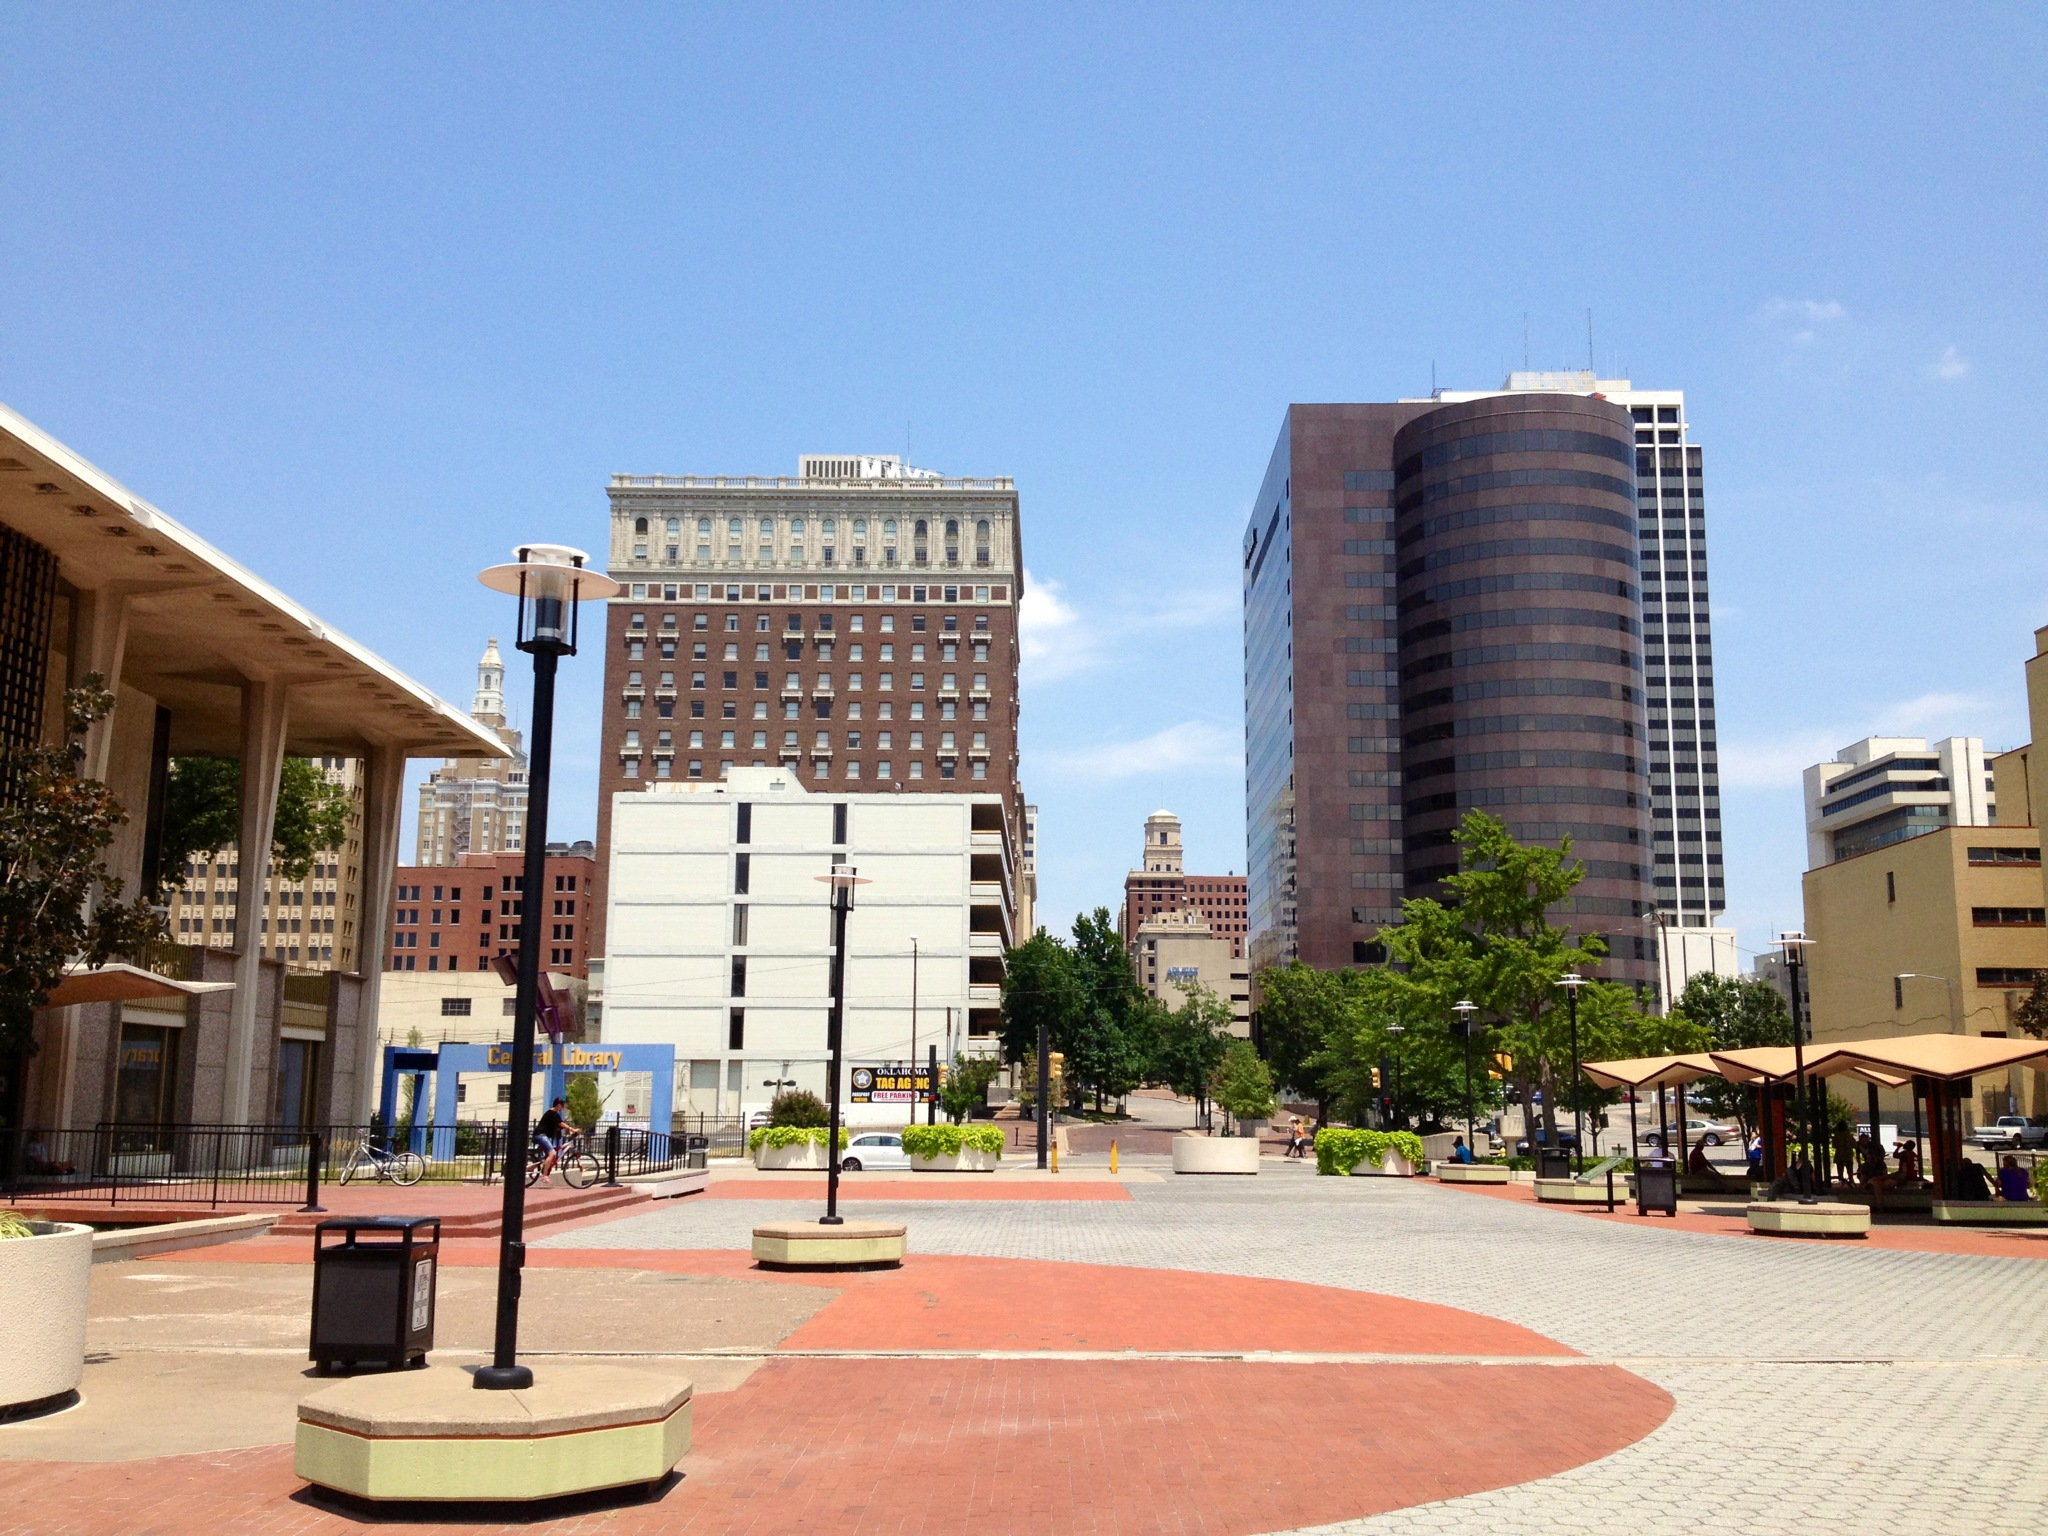 Downtown Tulsa, Oklahoma.